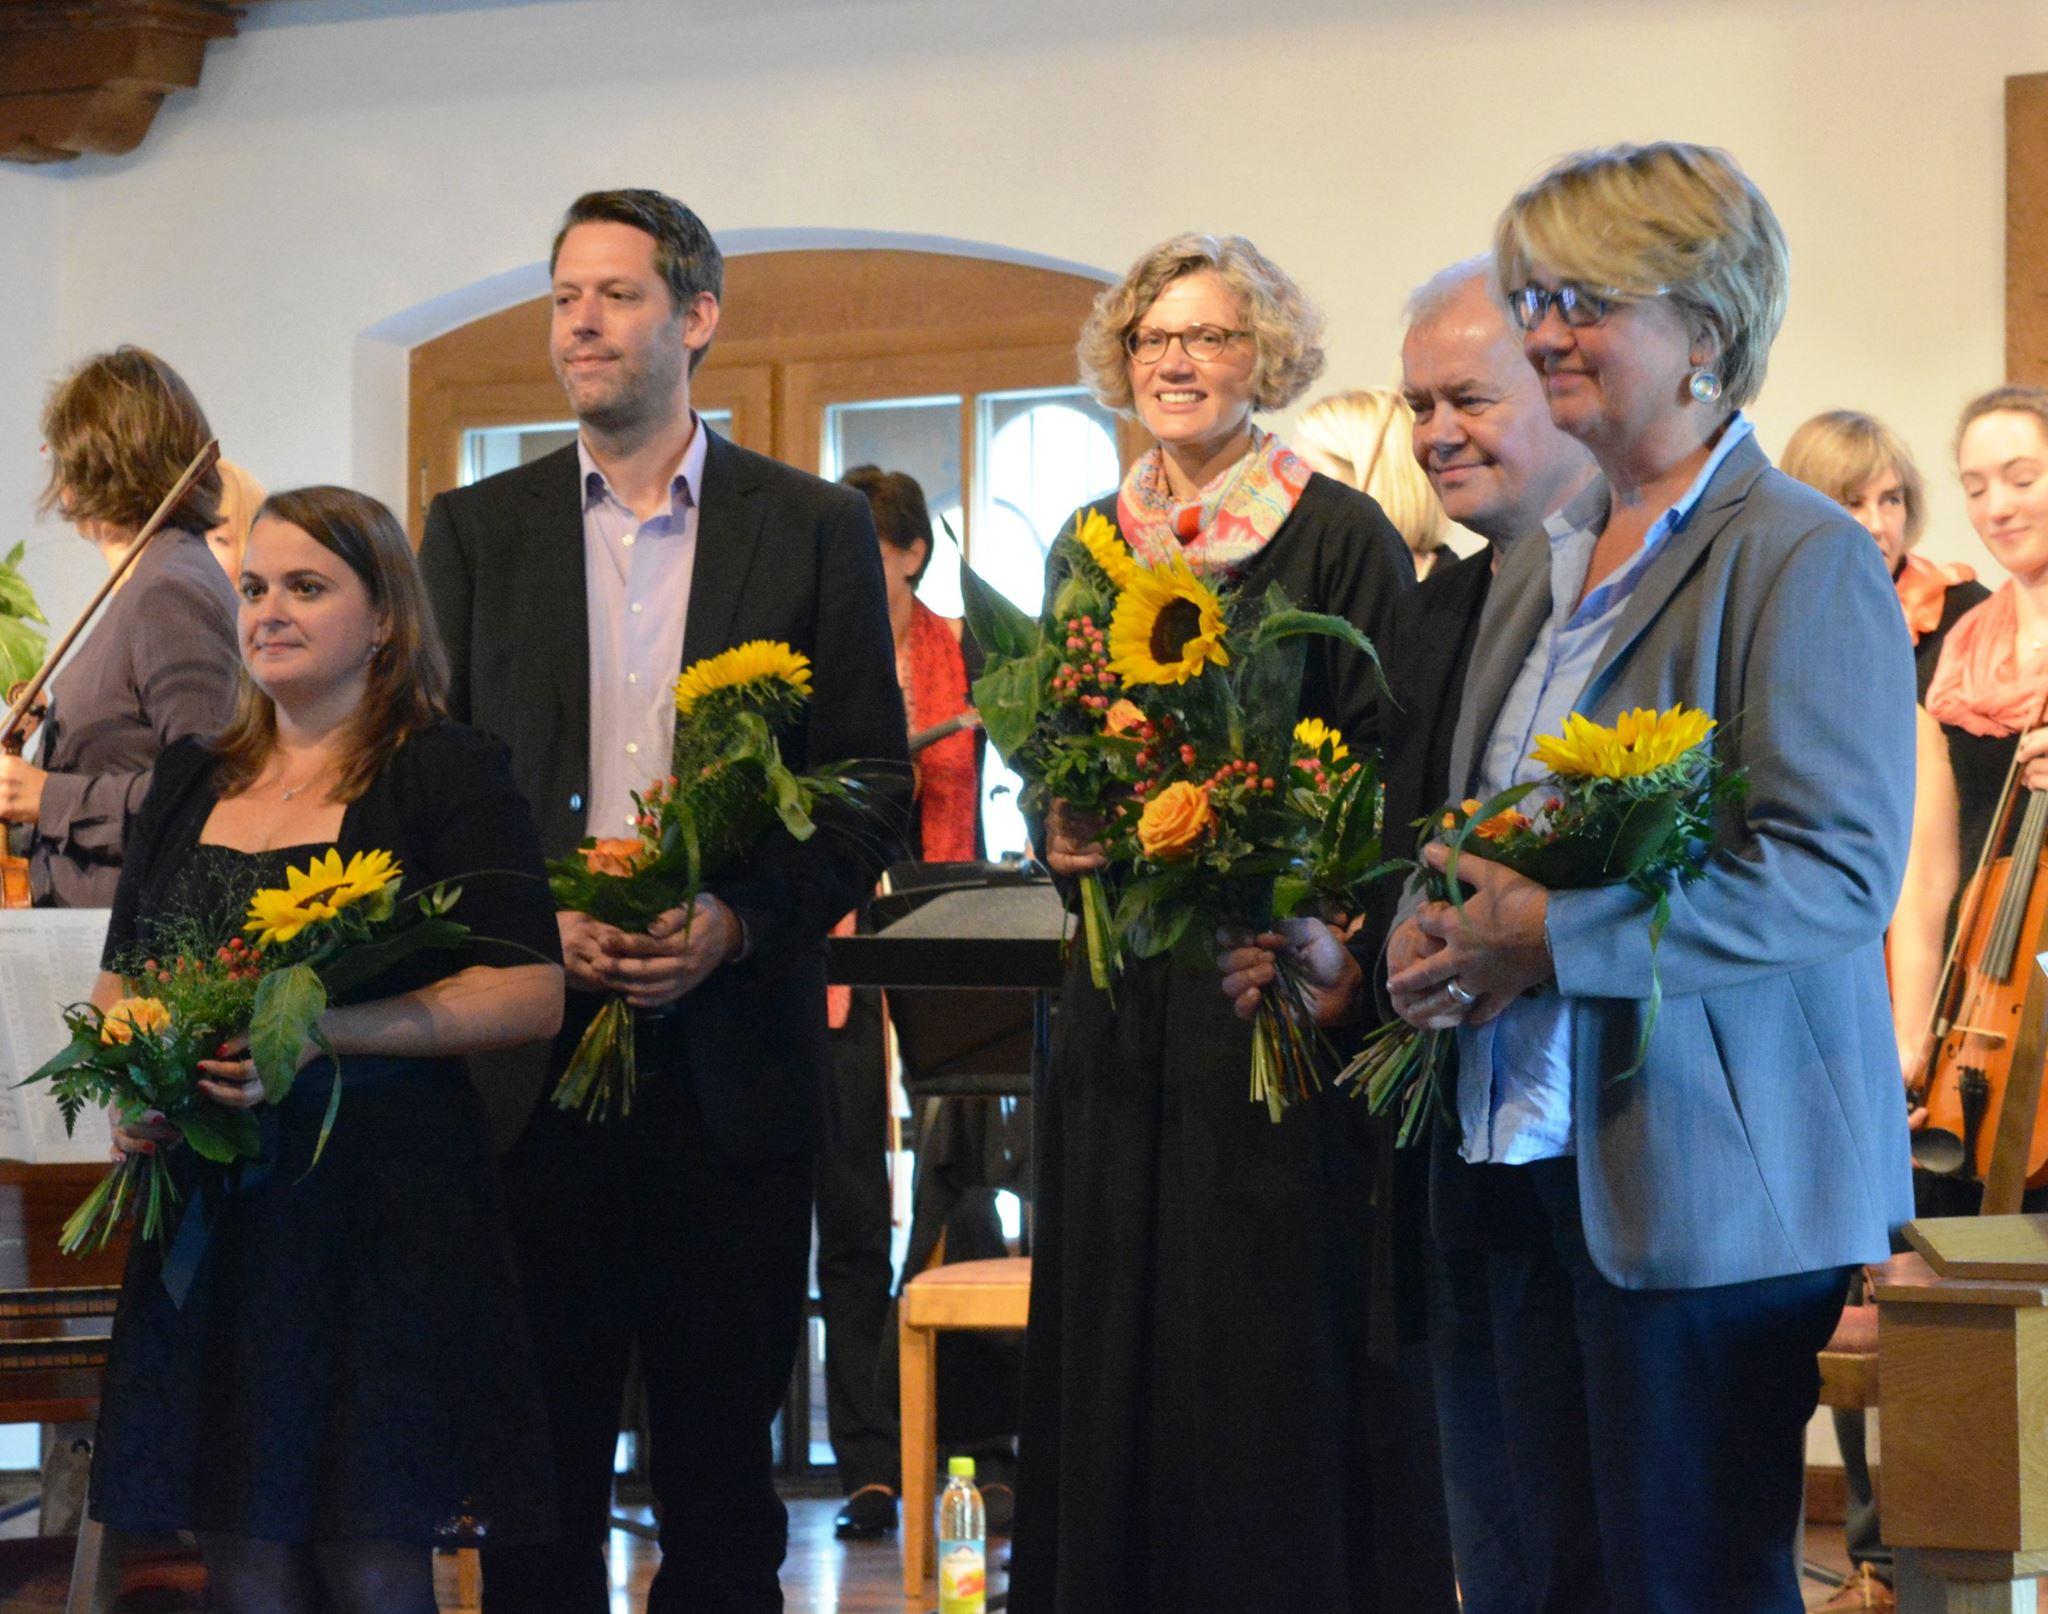 v.l.n.r. Meike Melinz, Jan-Eike Hornauer, Kristina Kuzminskaite, Lothar Thiel, Monika Veth